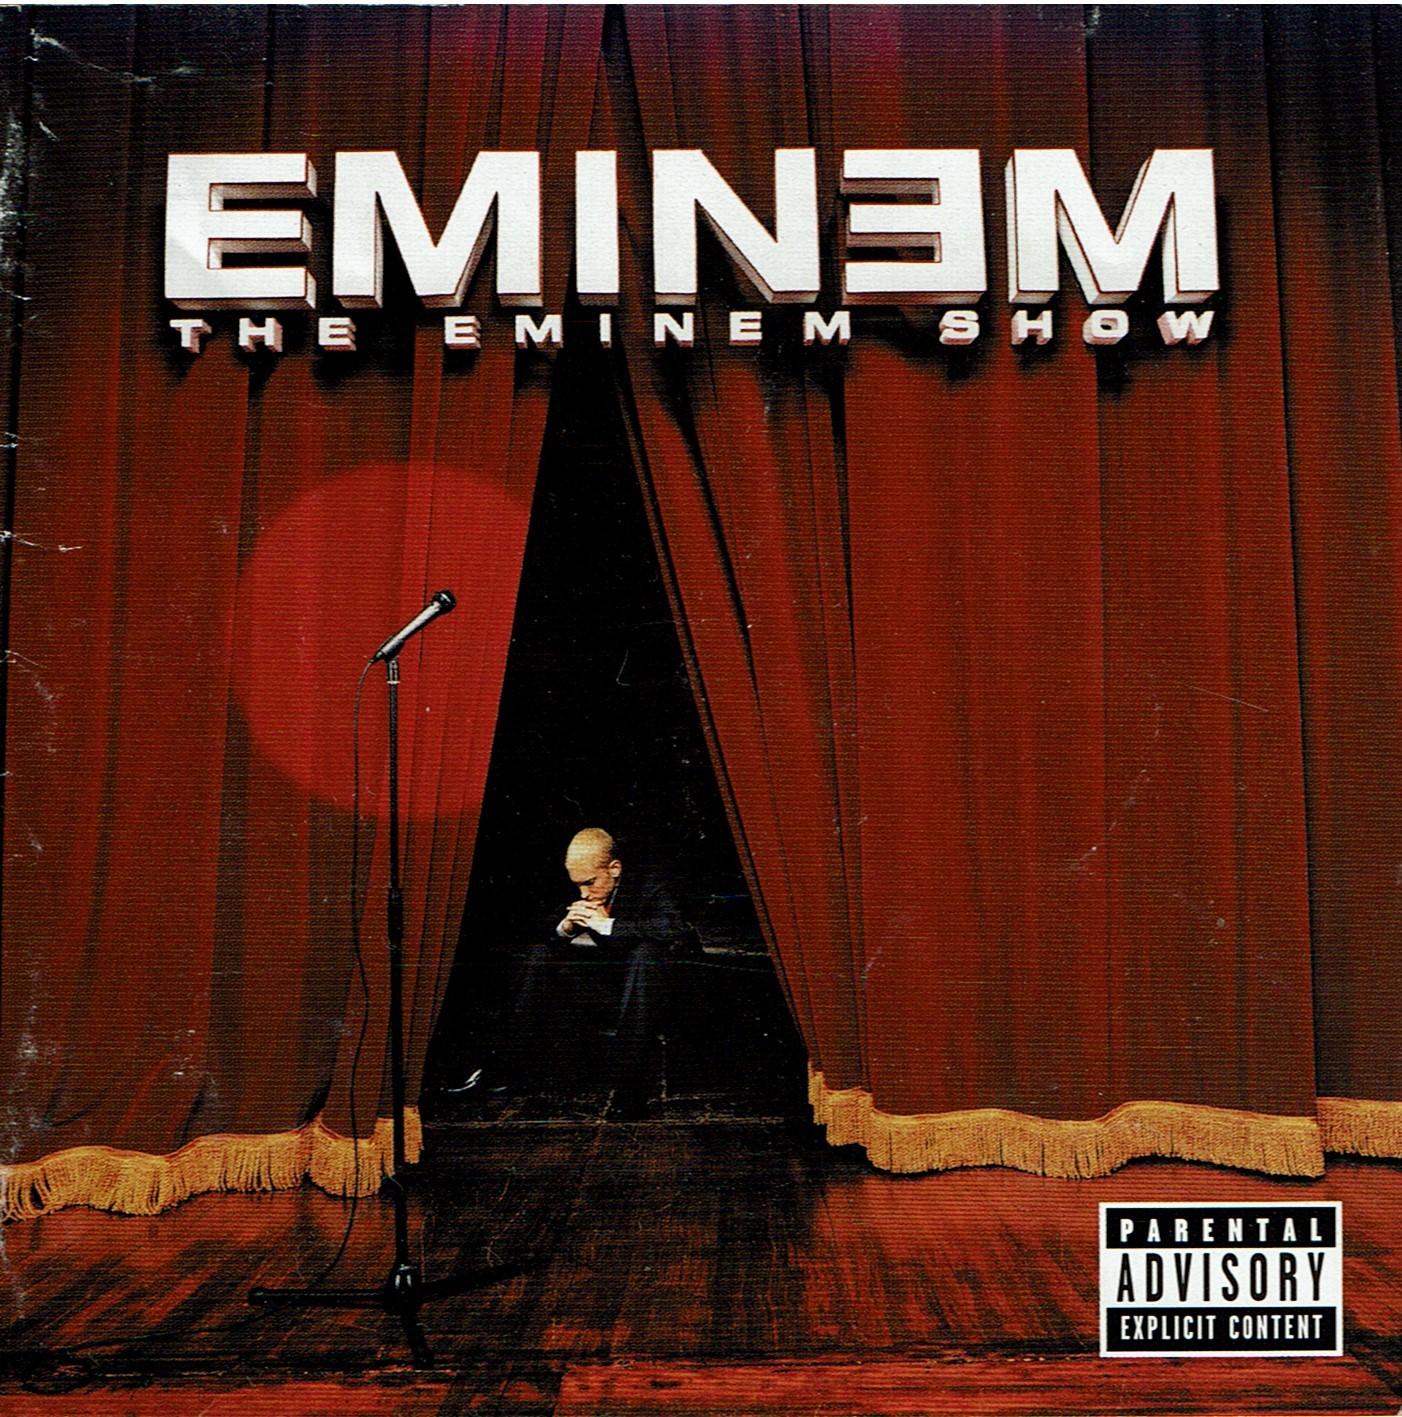 Eminem theeminemshow 01